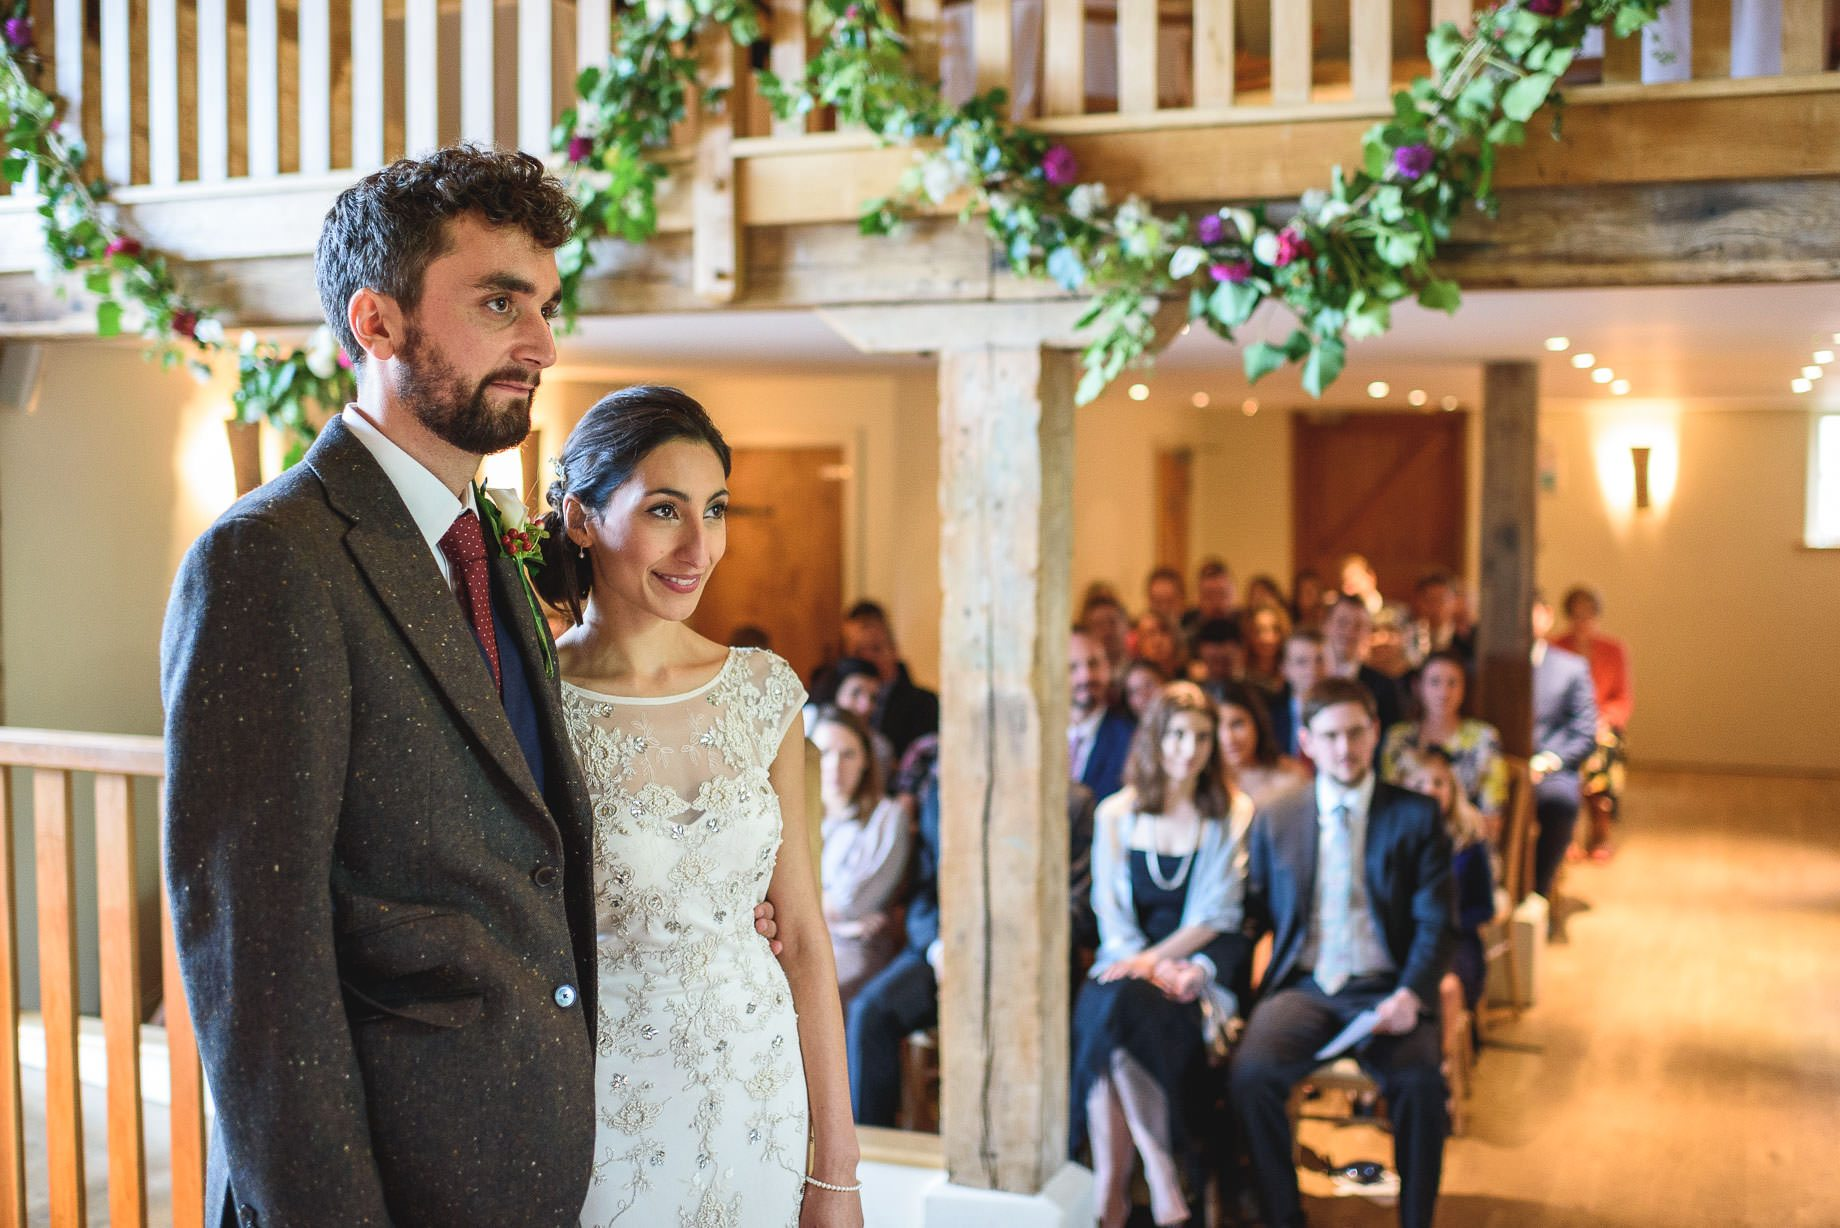 bury-court-barn-wedding-photography-guy-collier-photography-nadia-tom-59-of-184